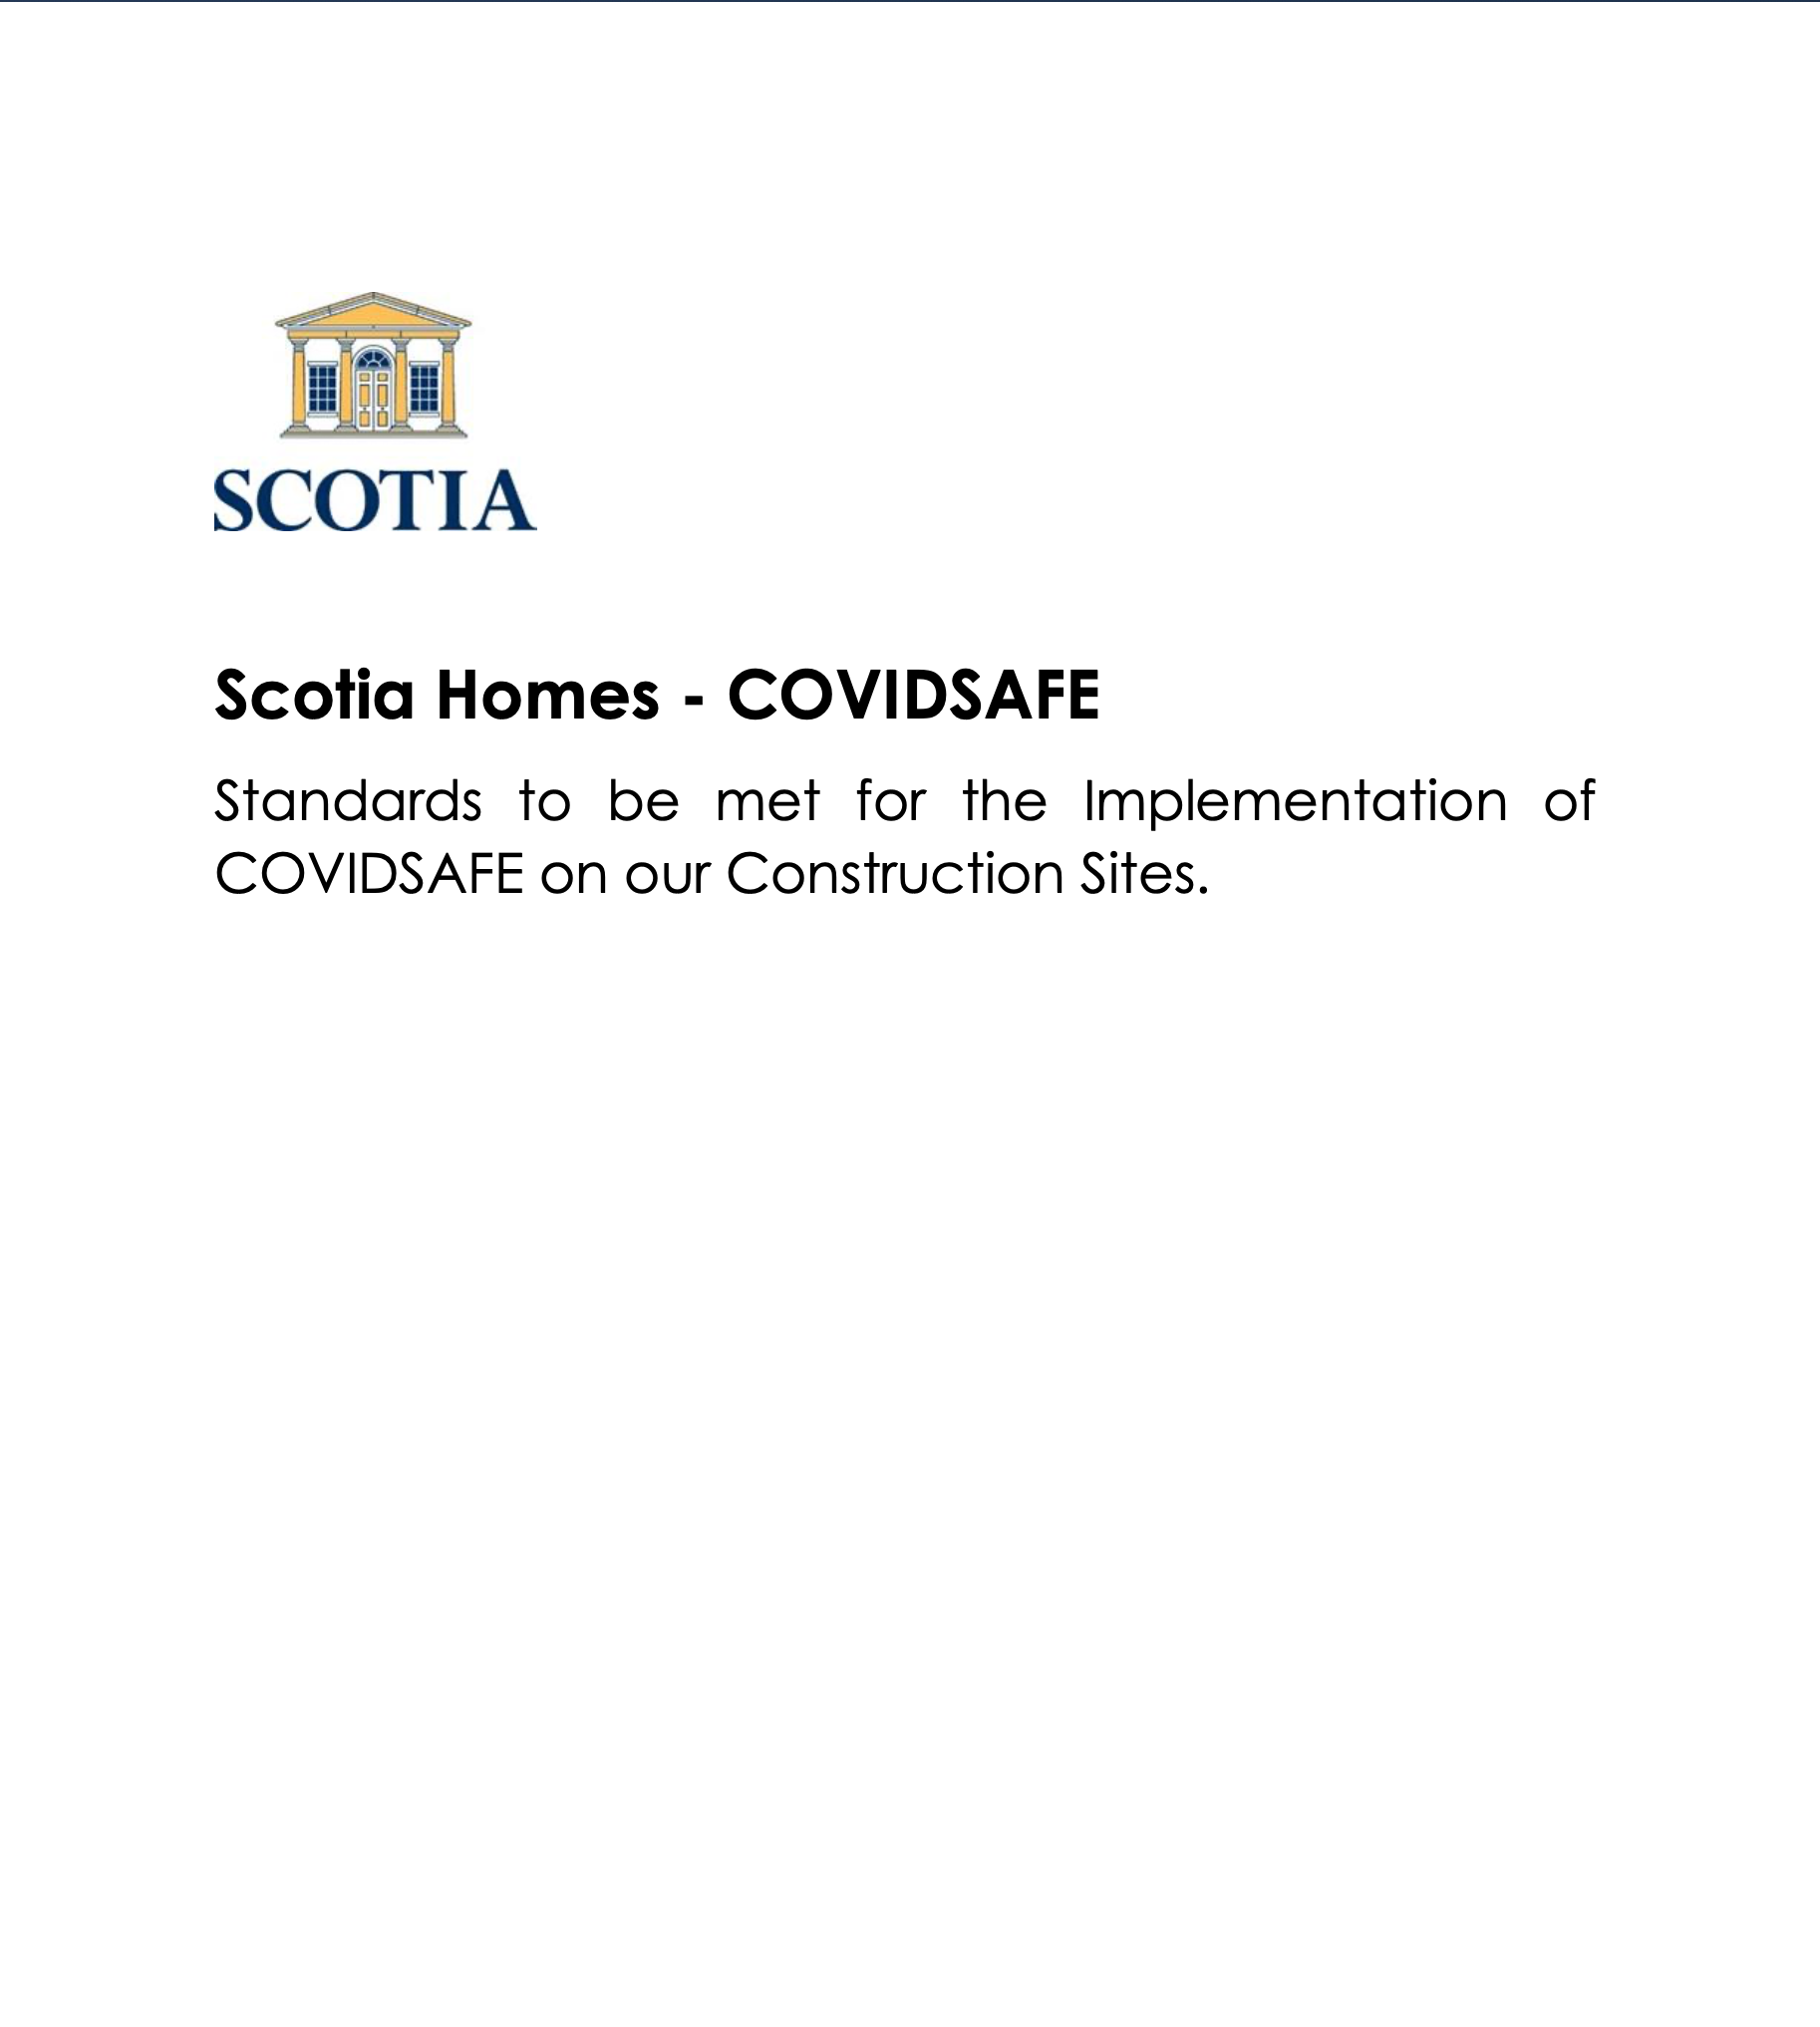 Scotia Homes - COVIDSAFE